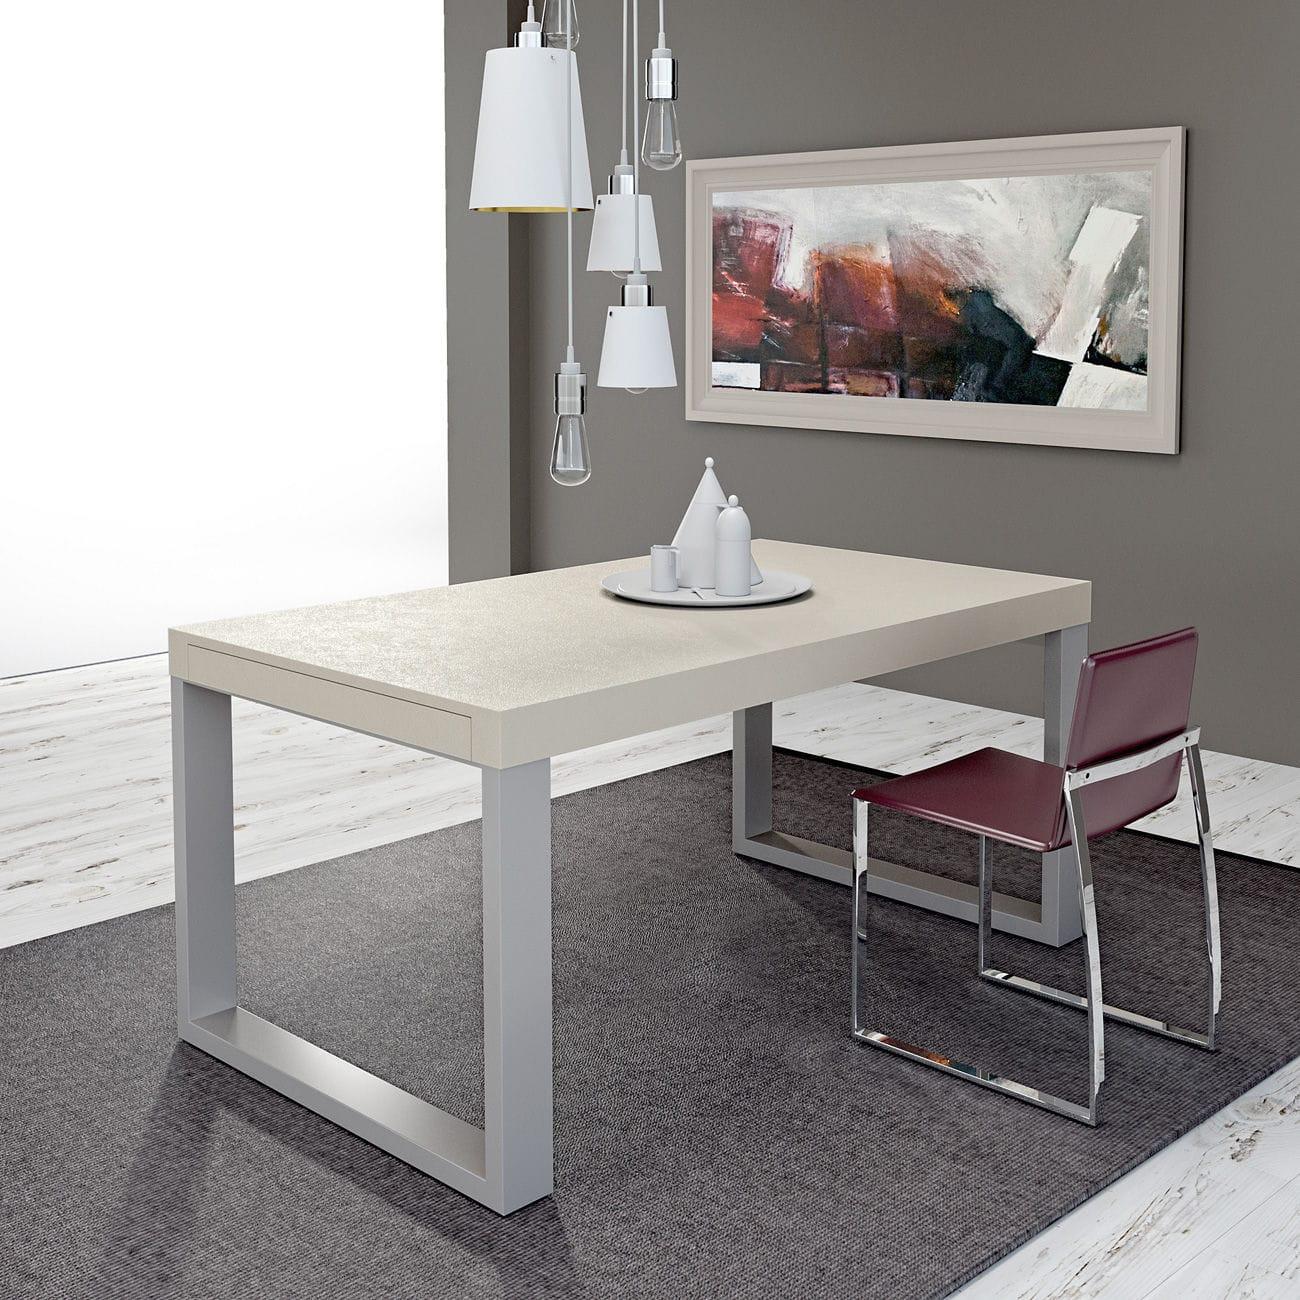 Moderner Esstisch / Metall / gebeiztes Holz / rechteckig - FRAME ...